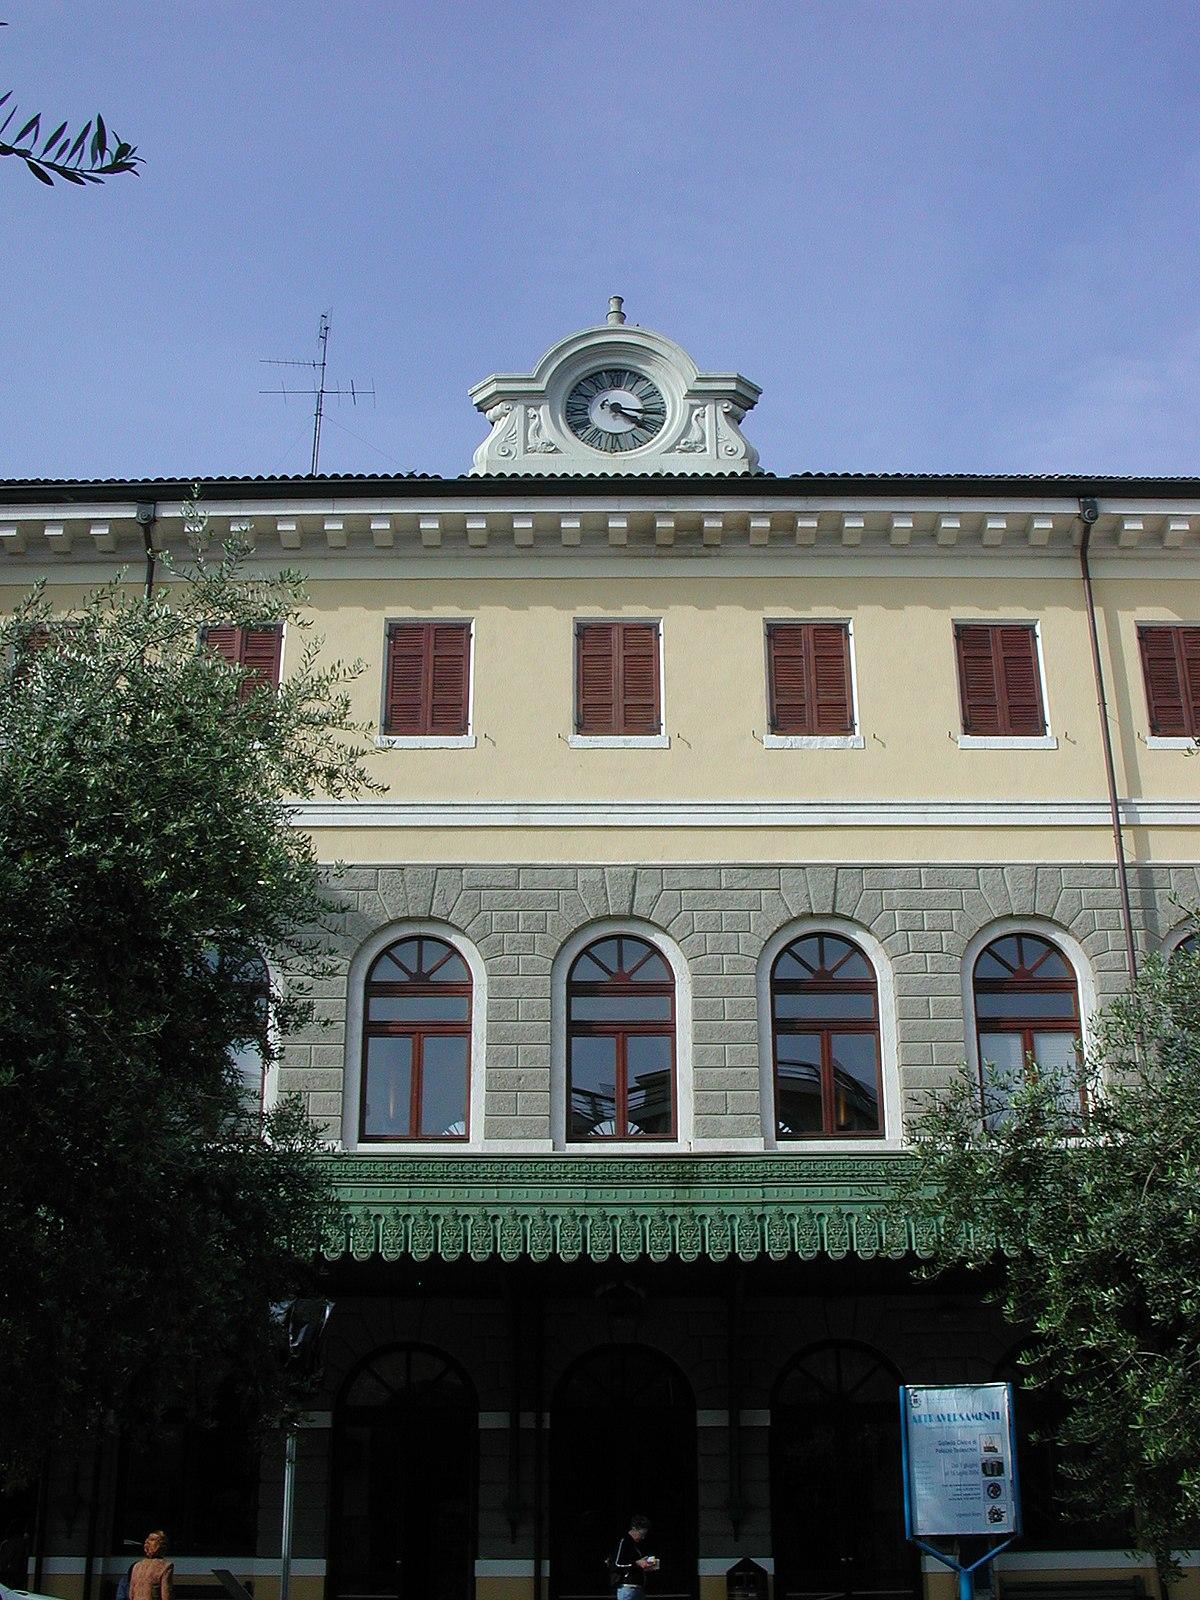 Via Durighello Desenzano Del Garda desenzano del garda-sirmione railway station - wikipedia